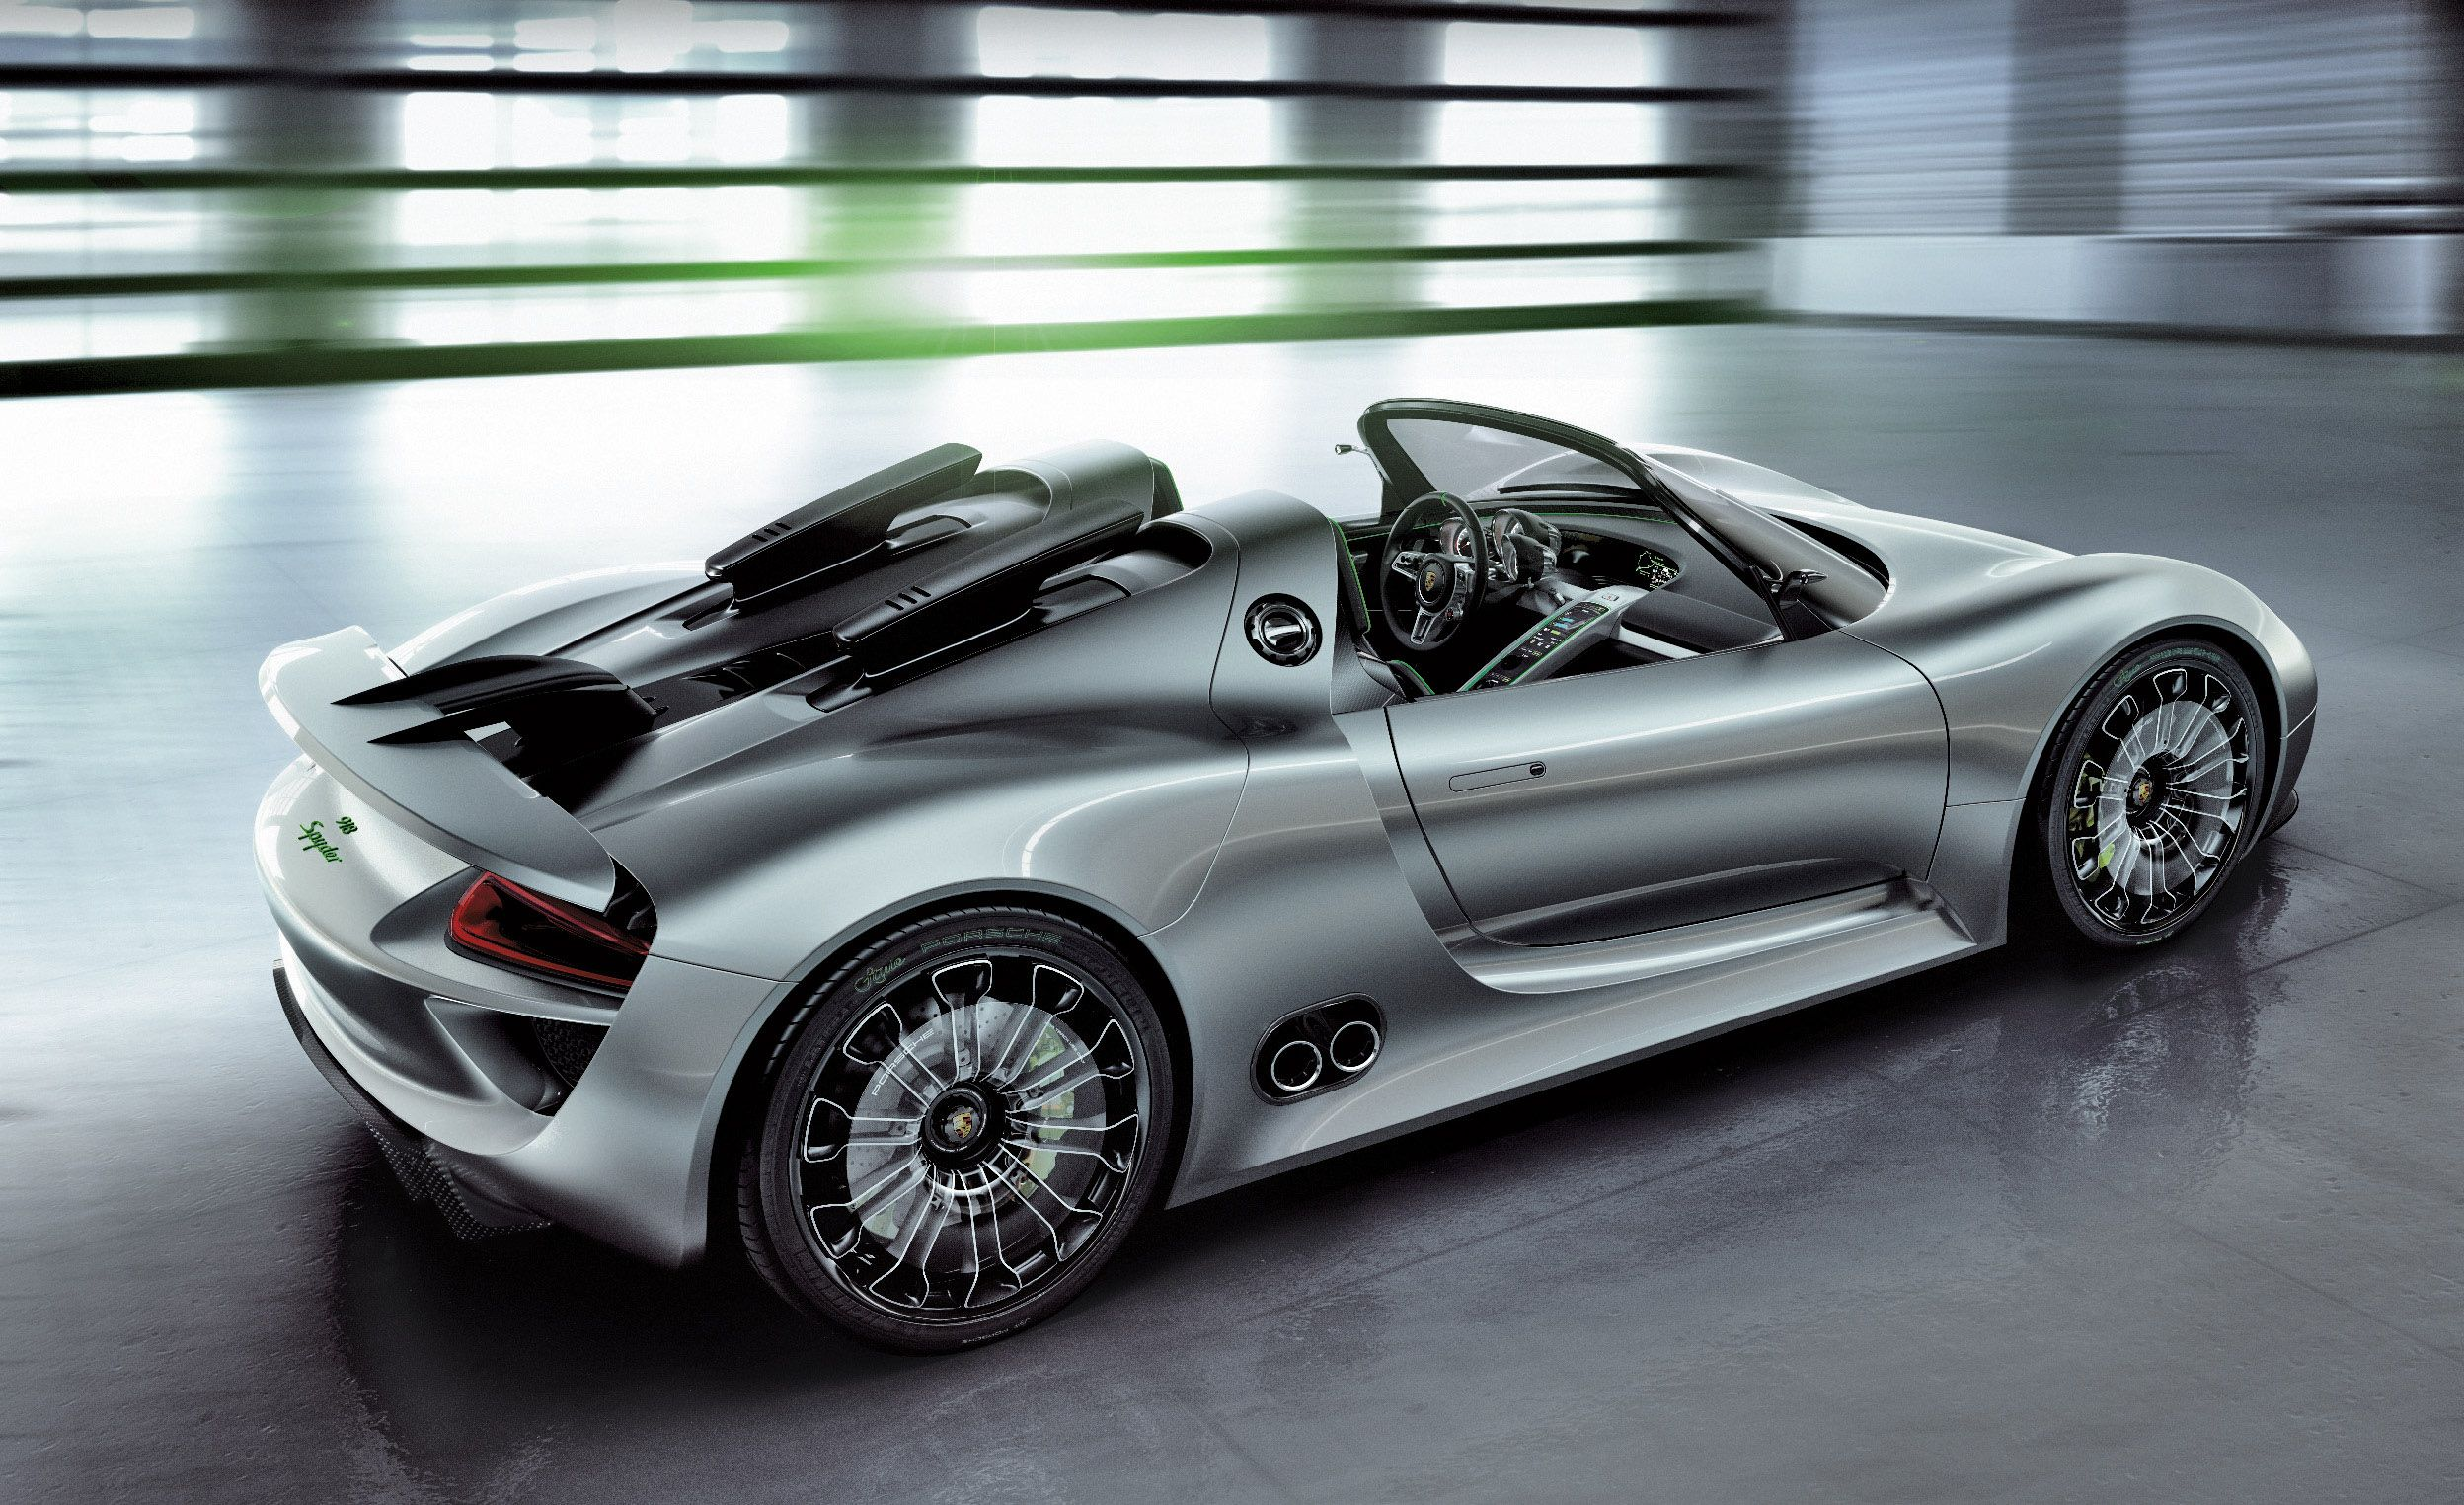 5474c51fe9c10_-_news-porsche-918-spyder-001 Elegant Porsche 918 Spyder Los Angeles Cars Trend